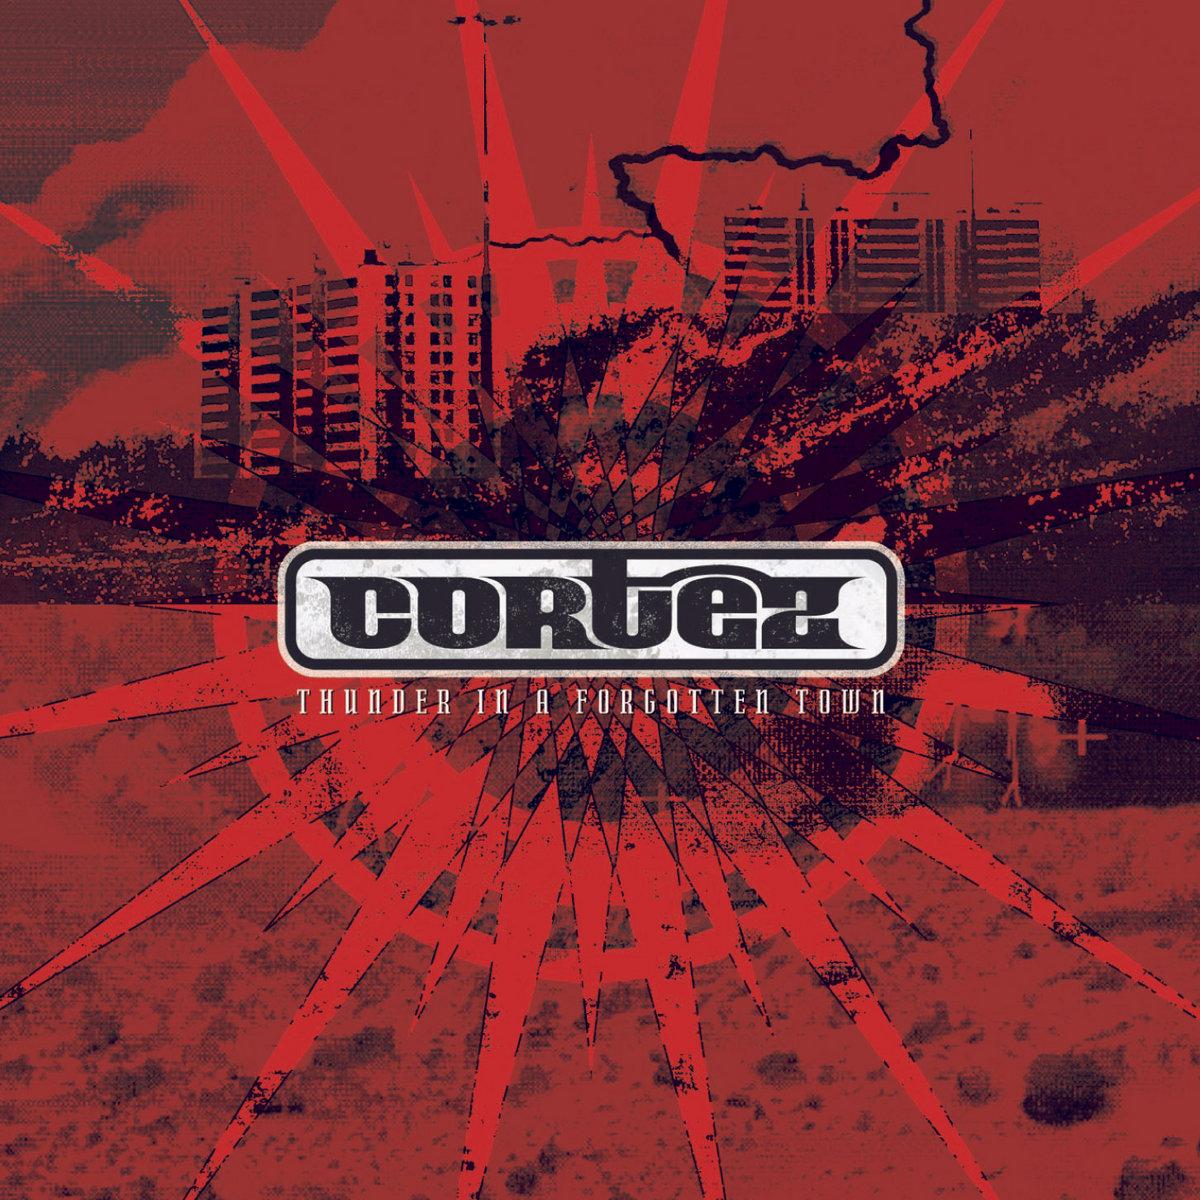 Cortez Thunder in a Forgotten Town